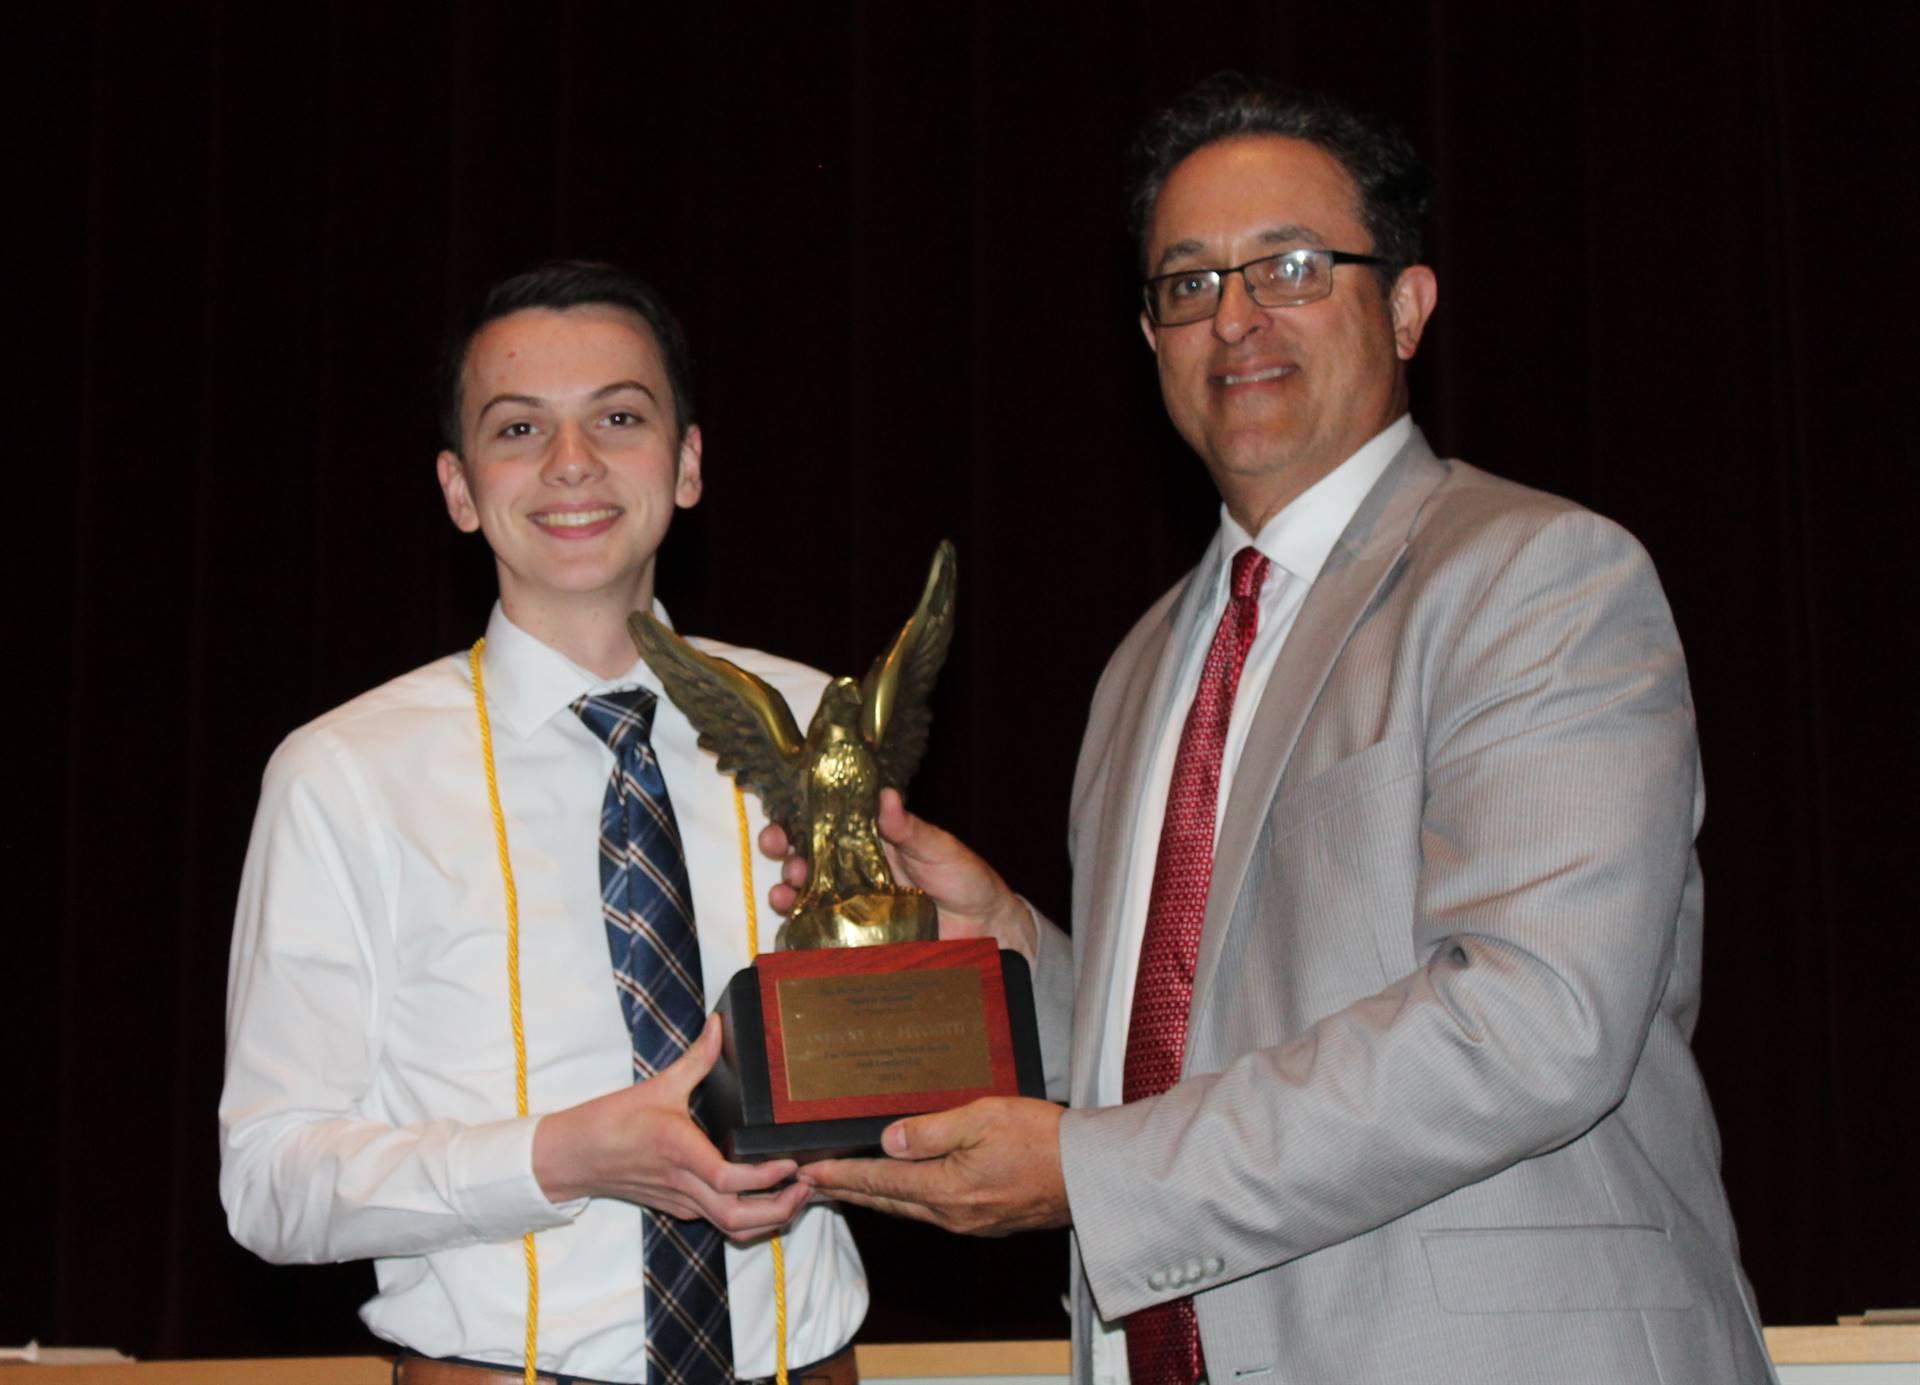 Student receiving the Spirit Award